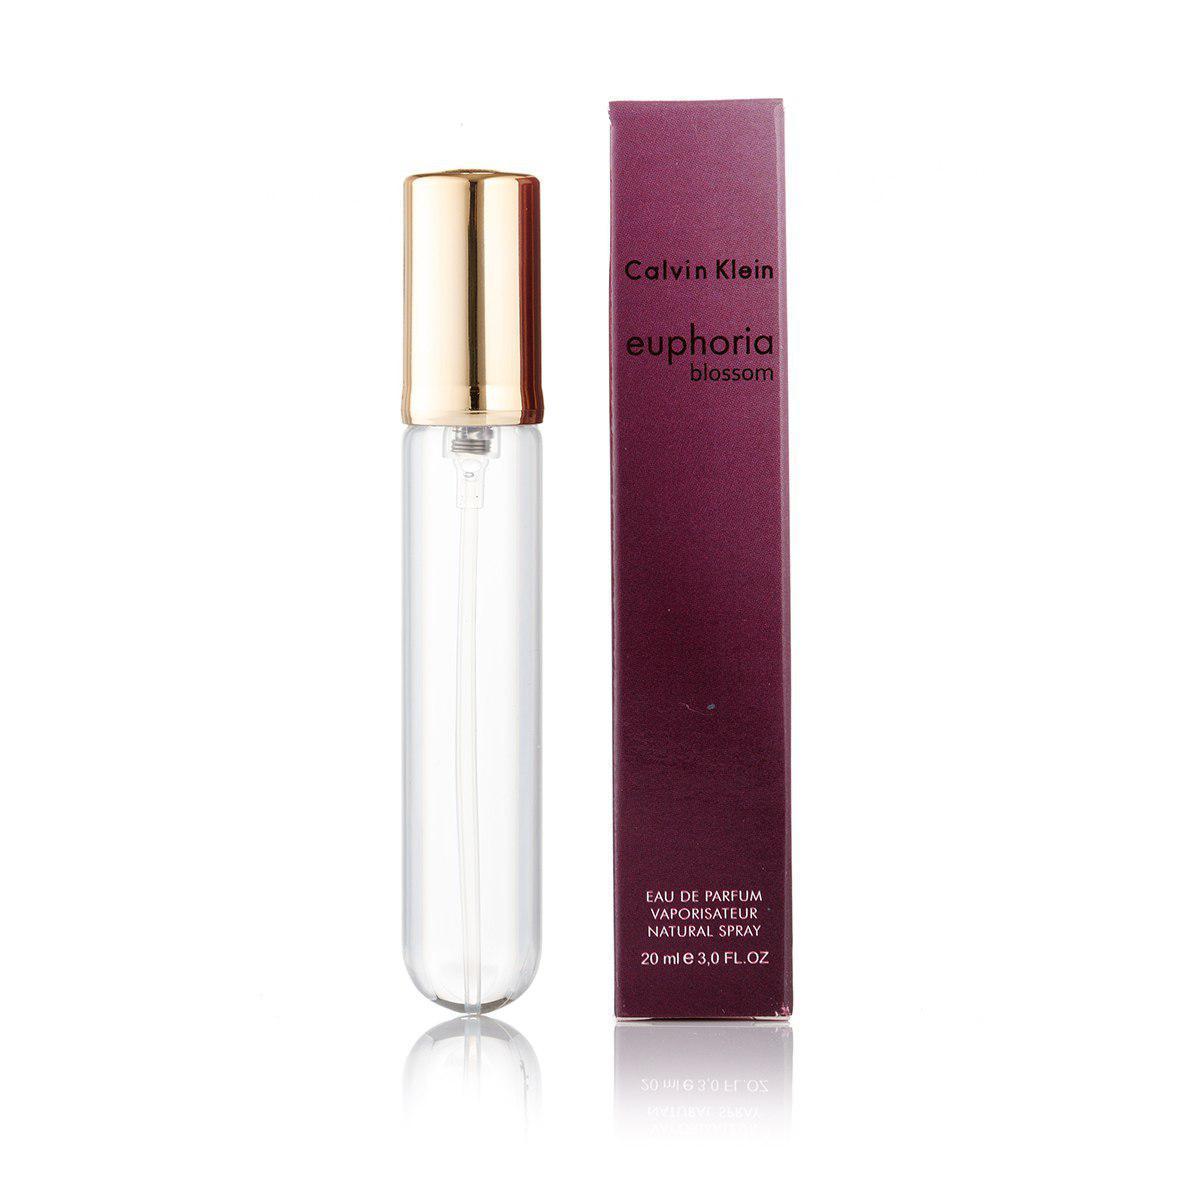 Женский мини парфюм Calvin Klein Euphoria Blossom - 20 мл